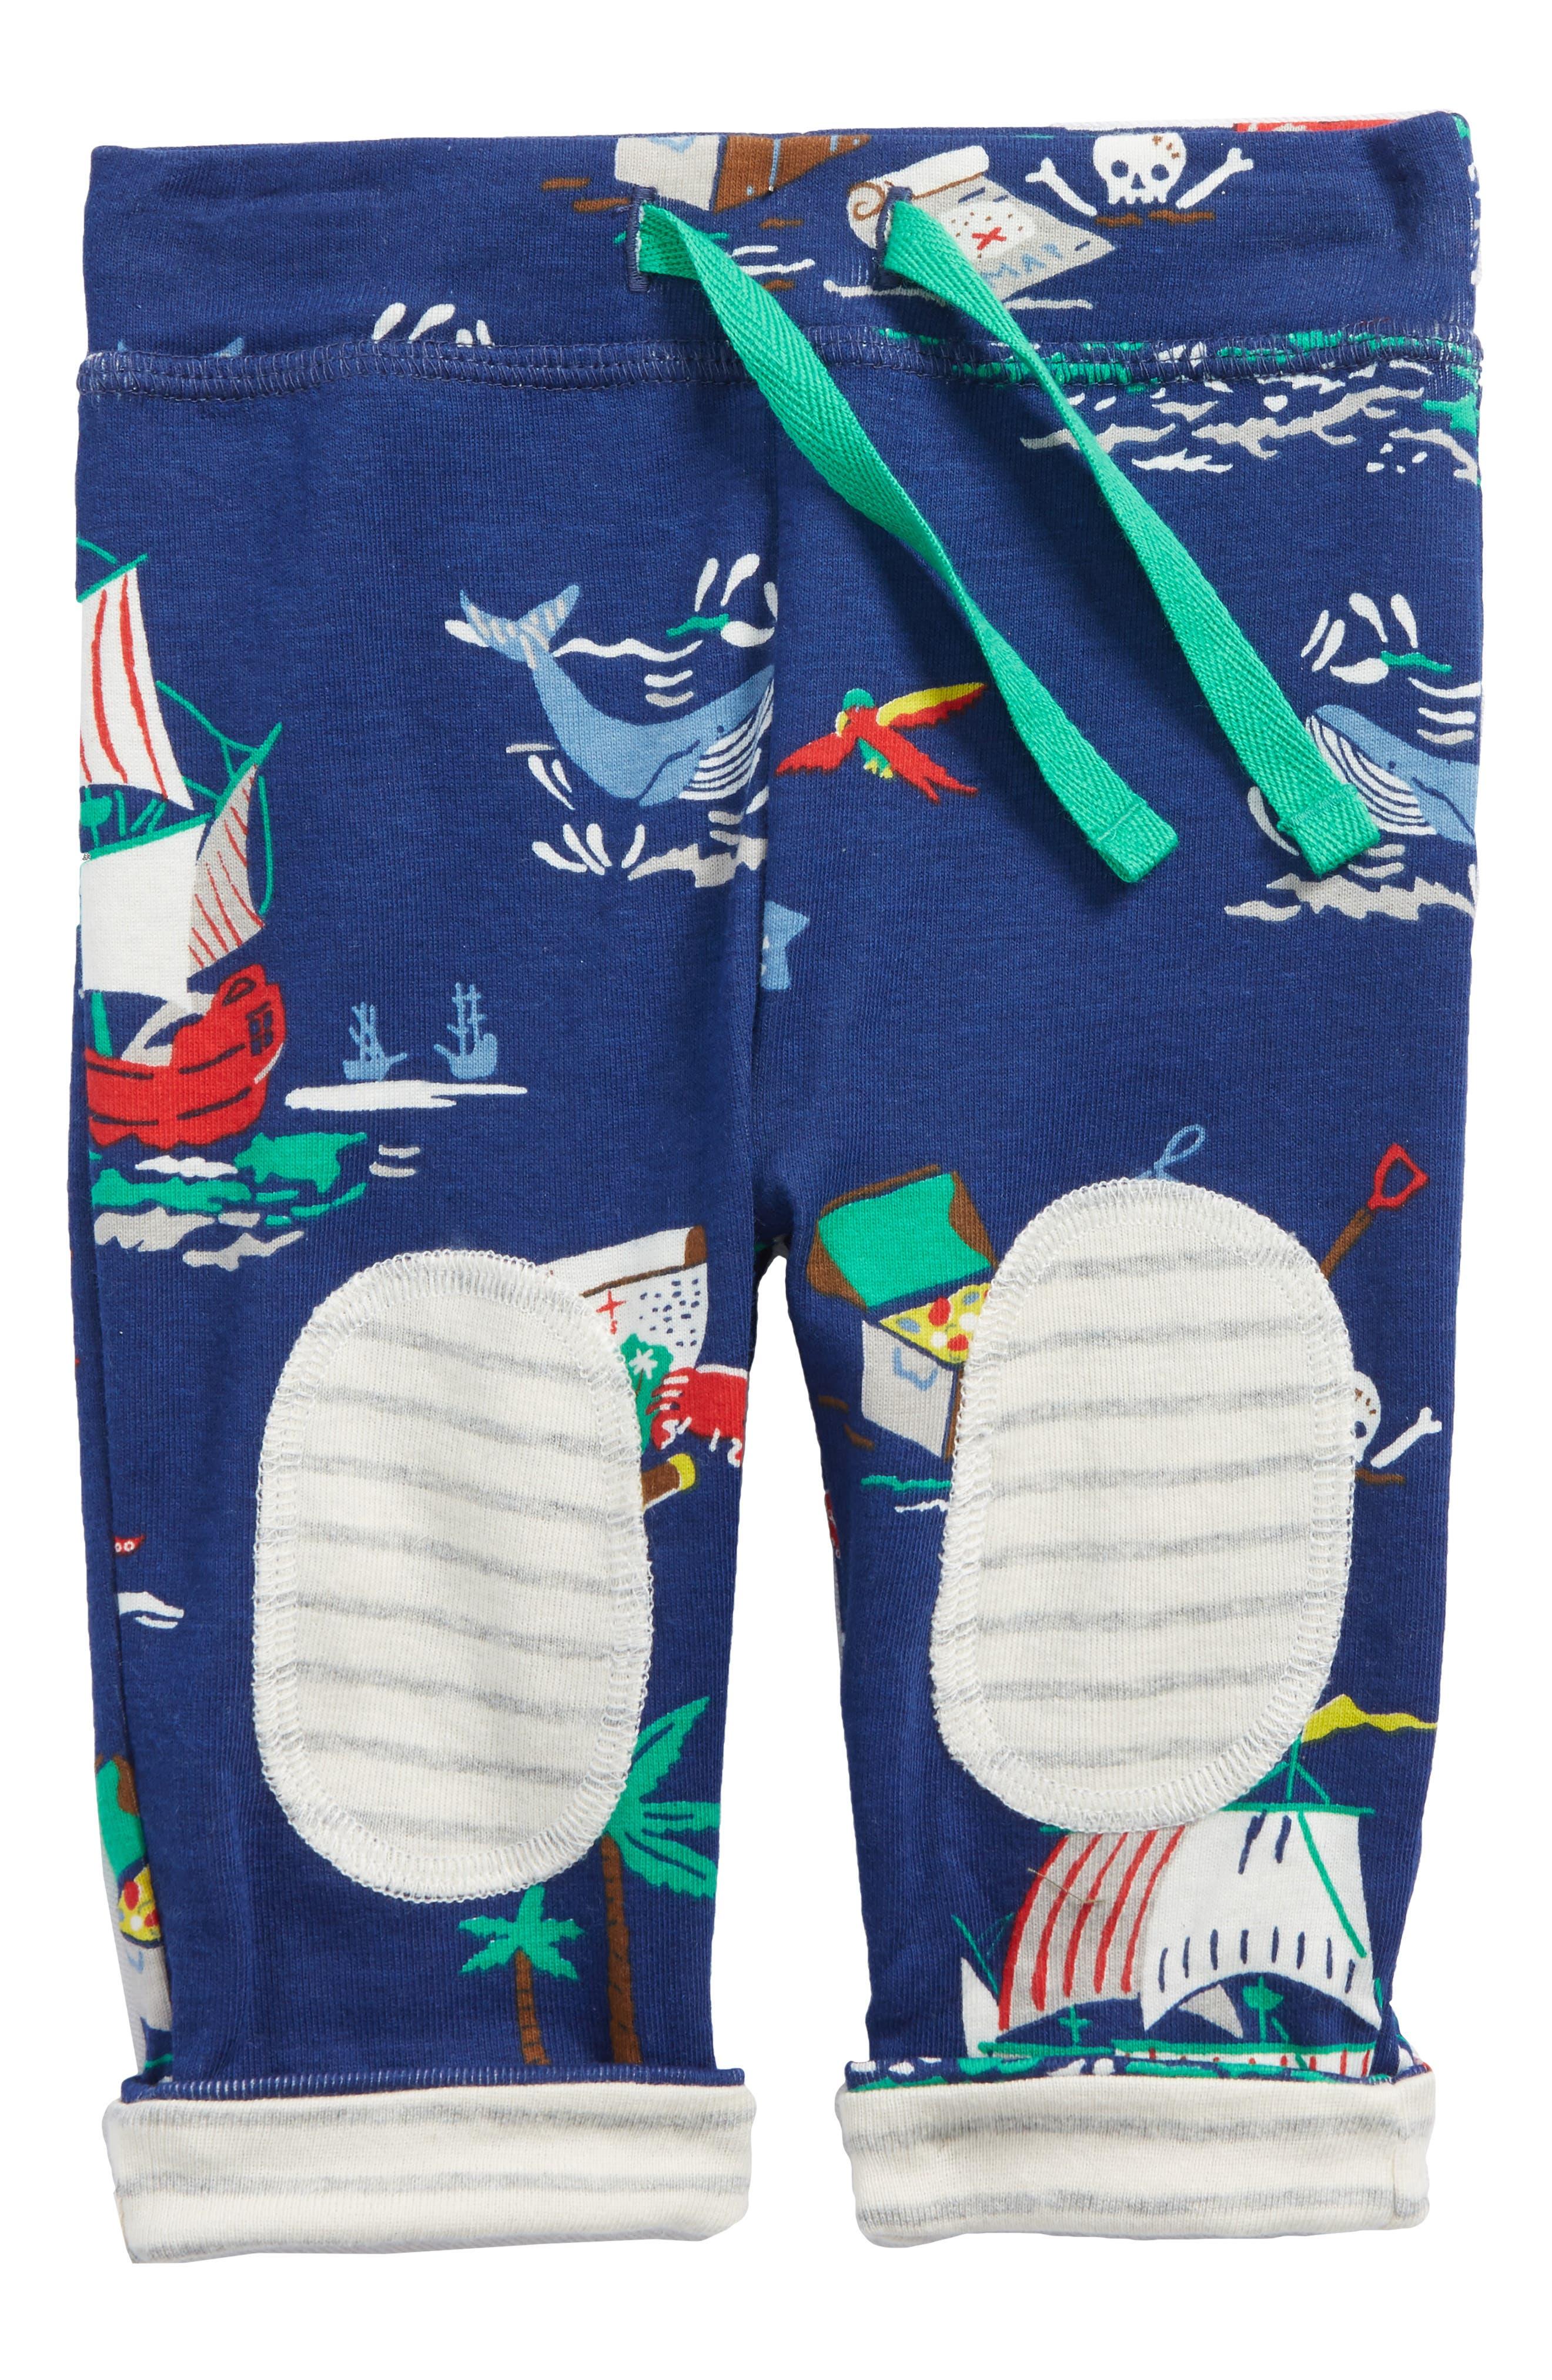 Reversible Knee Patch Pants,                         Main,                         color, Beacon Blue/ Pirate Ship